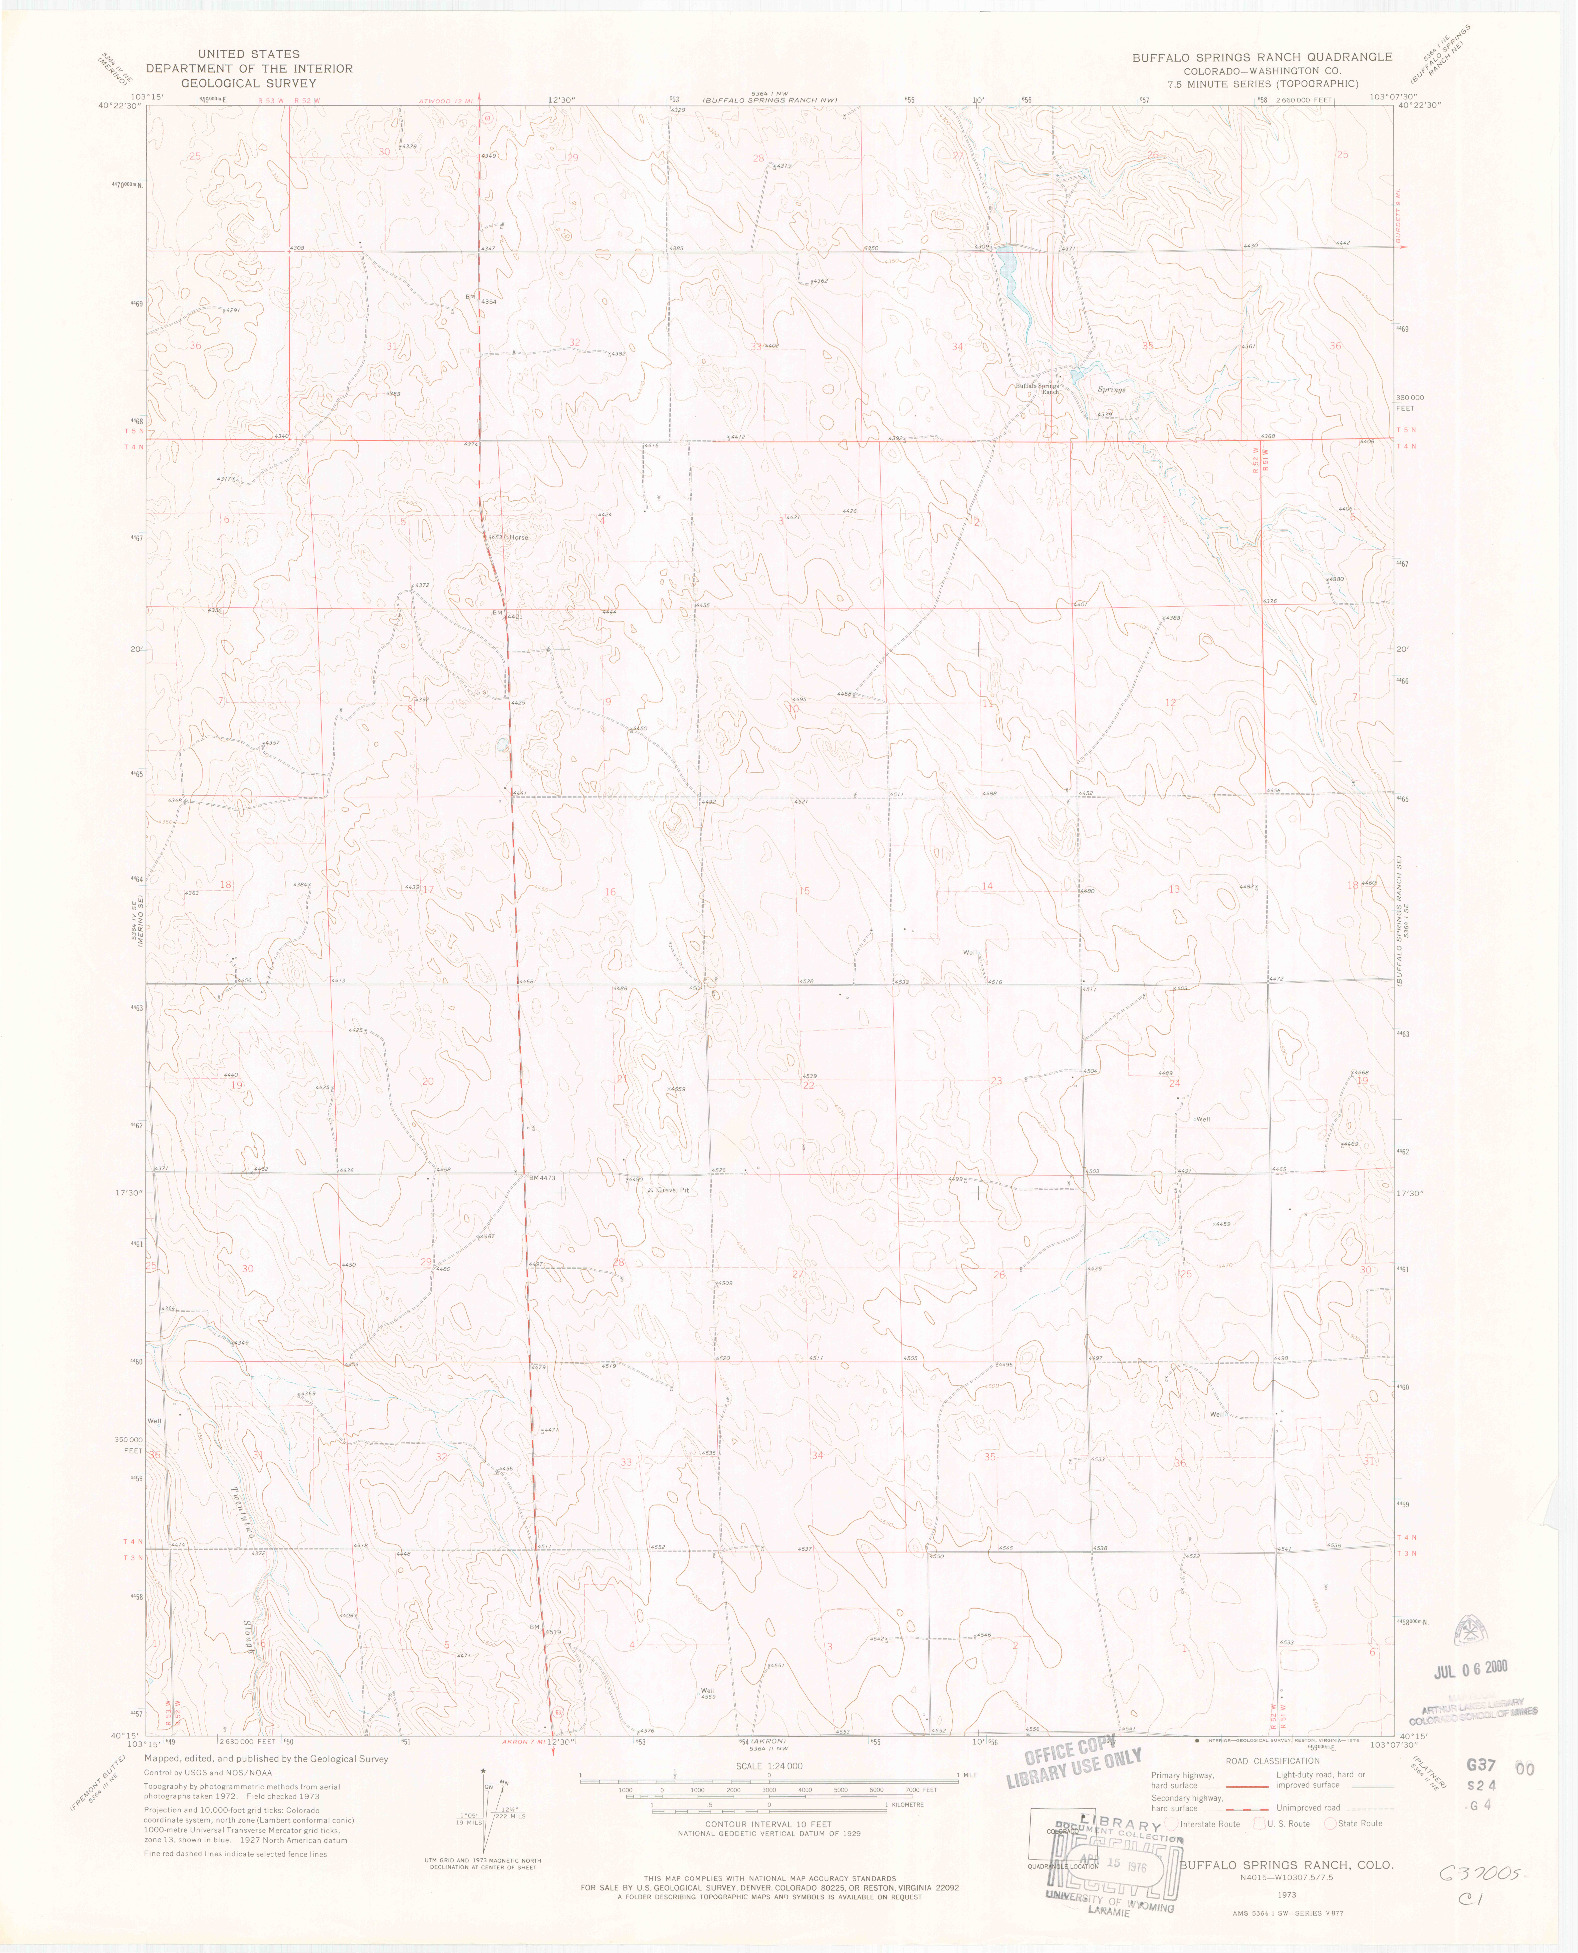 USGS 1:24000-SCALE QUADRANGLE FOR BUFFALO SPRINGS RANCH, CO 1973